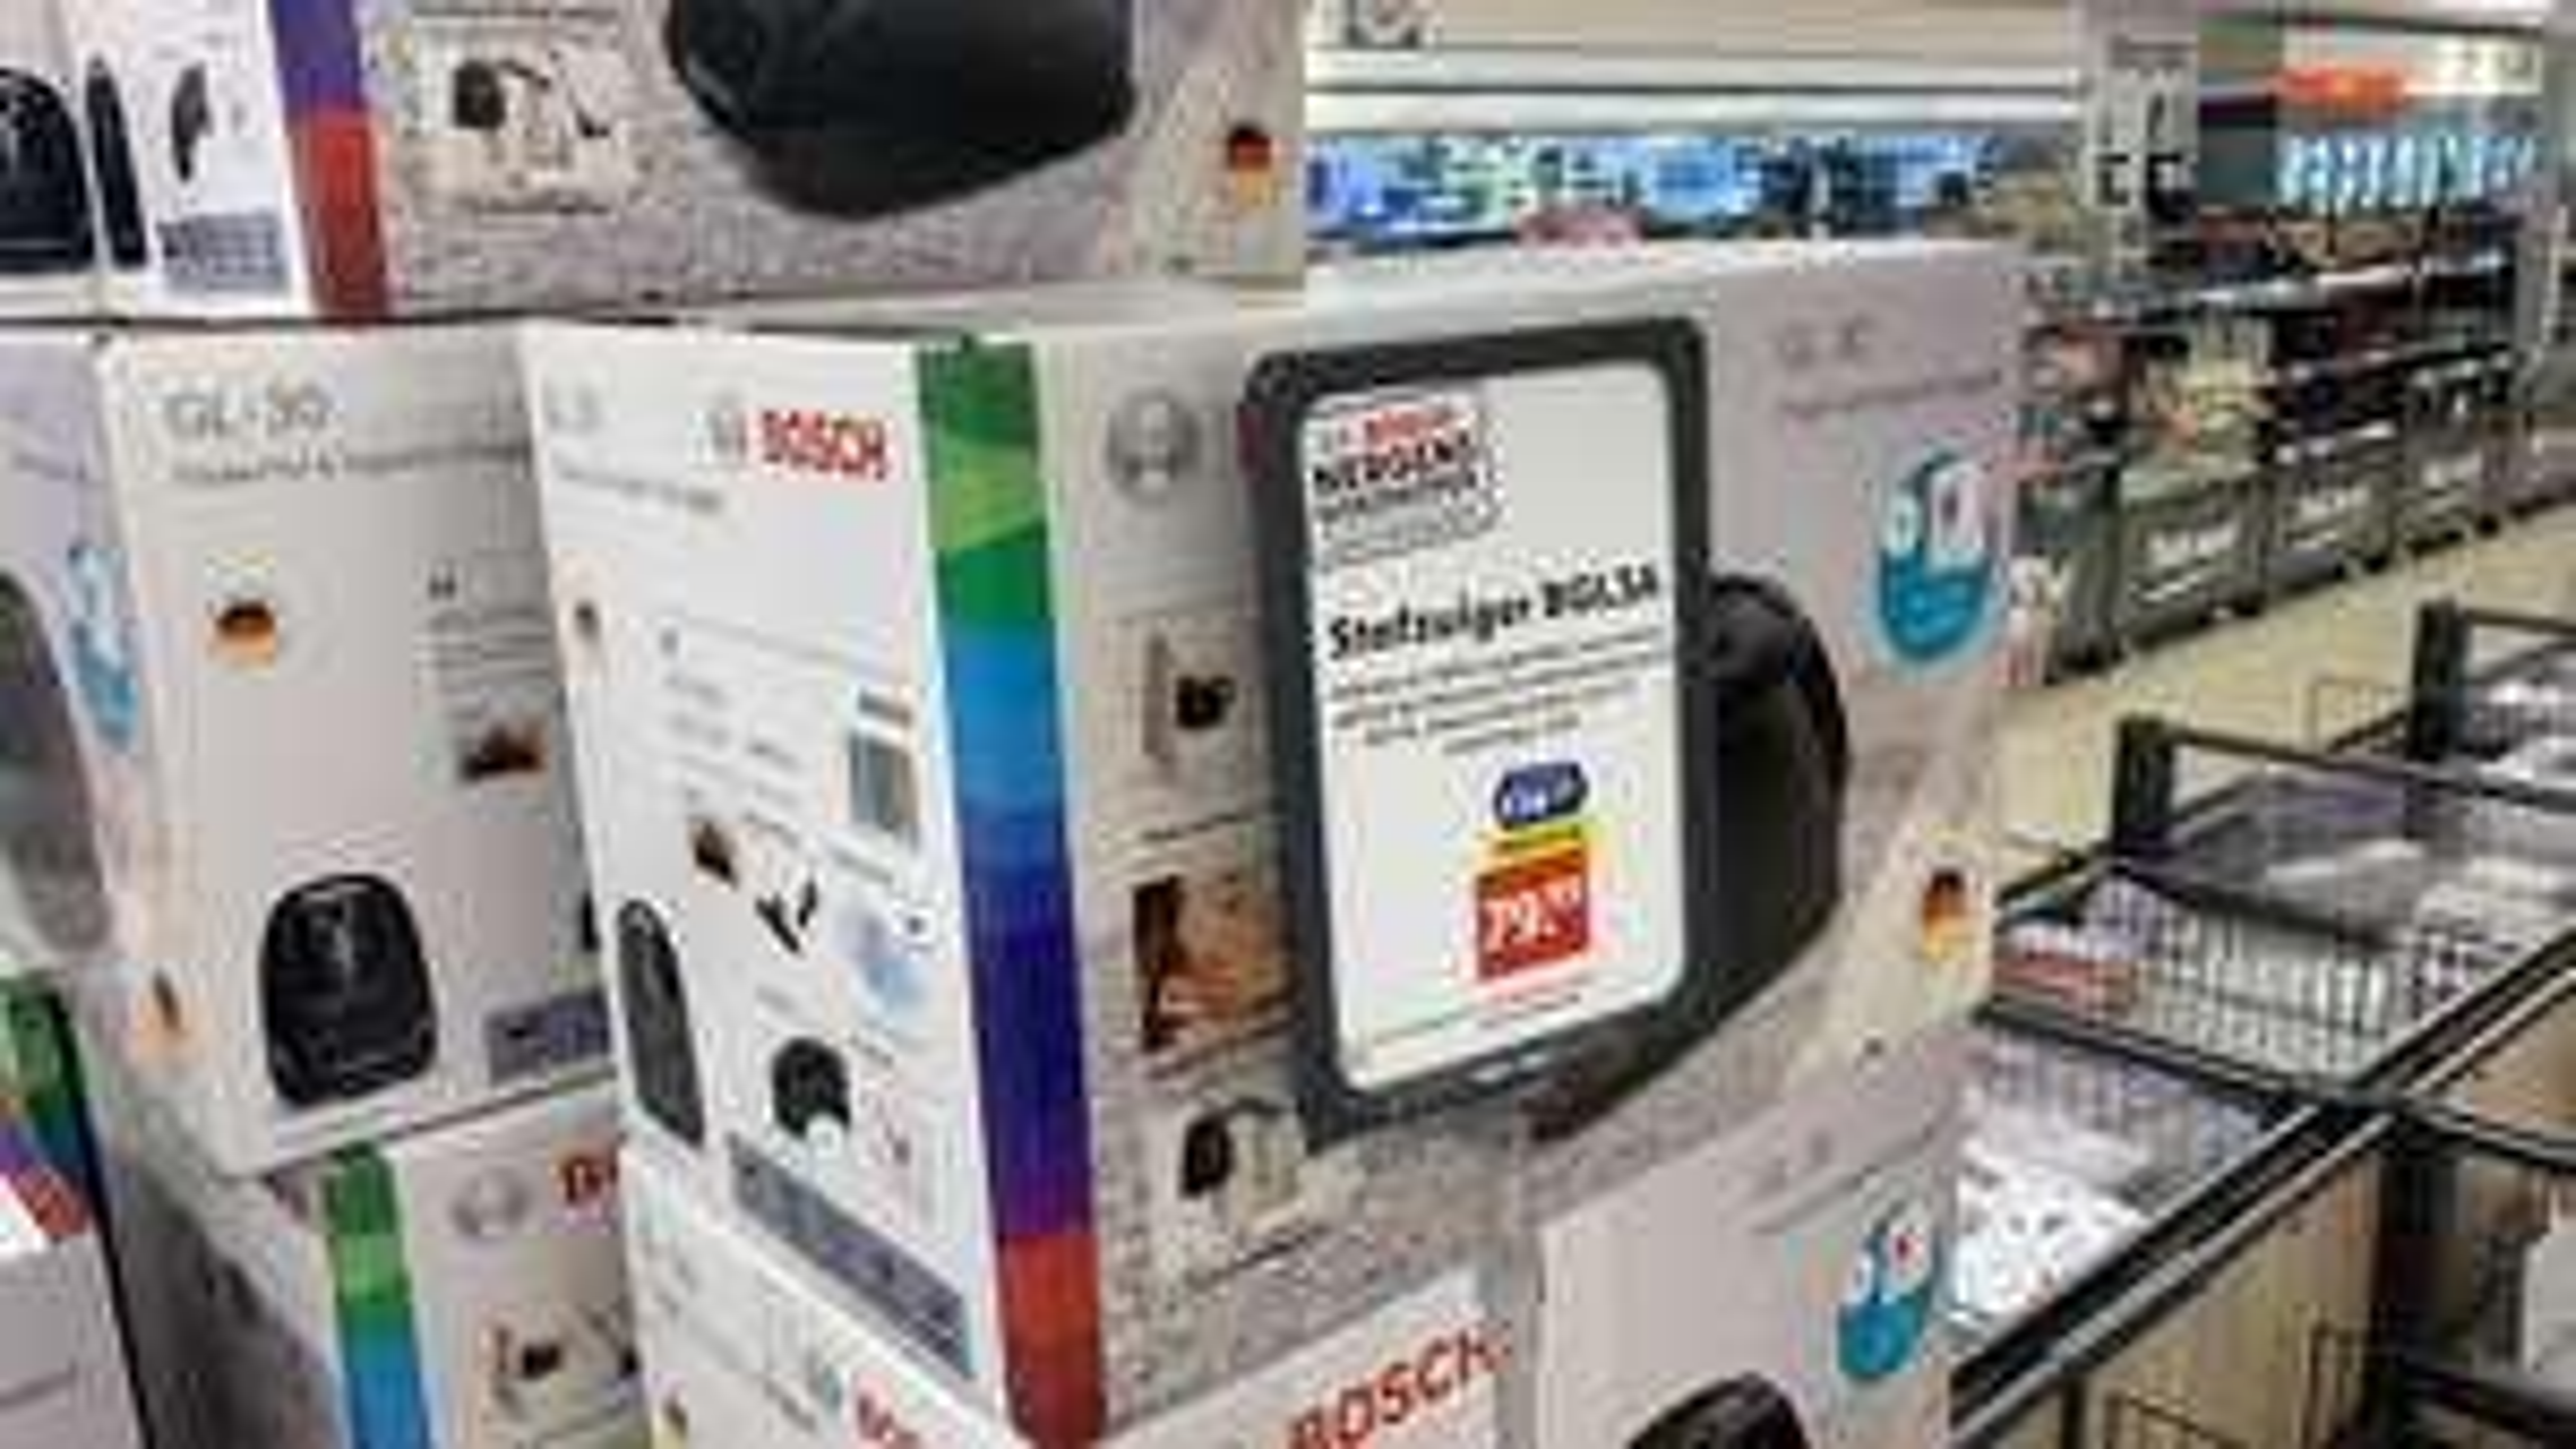 Bosch stofzuiger GL-30